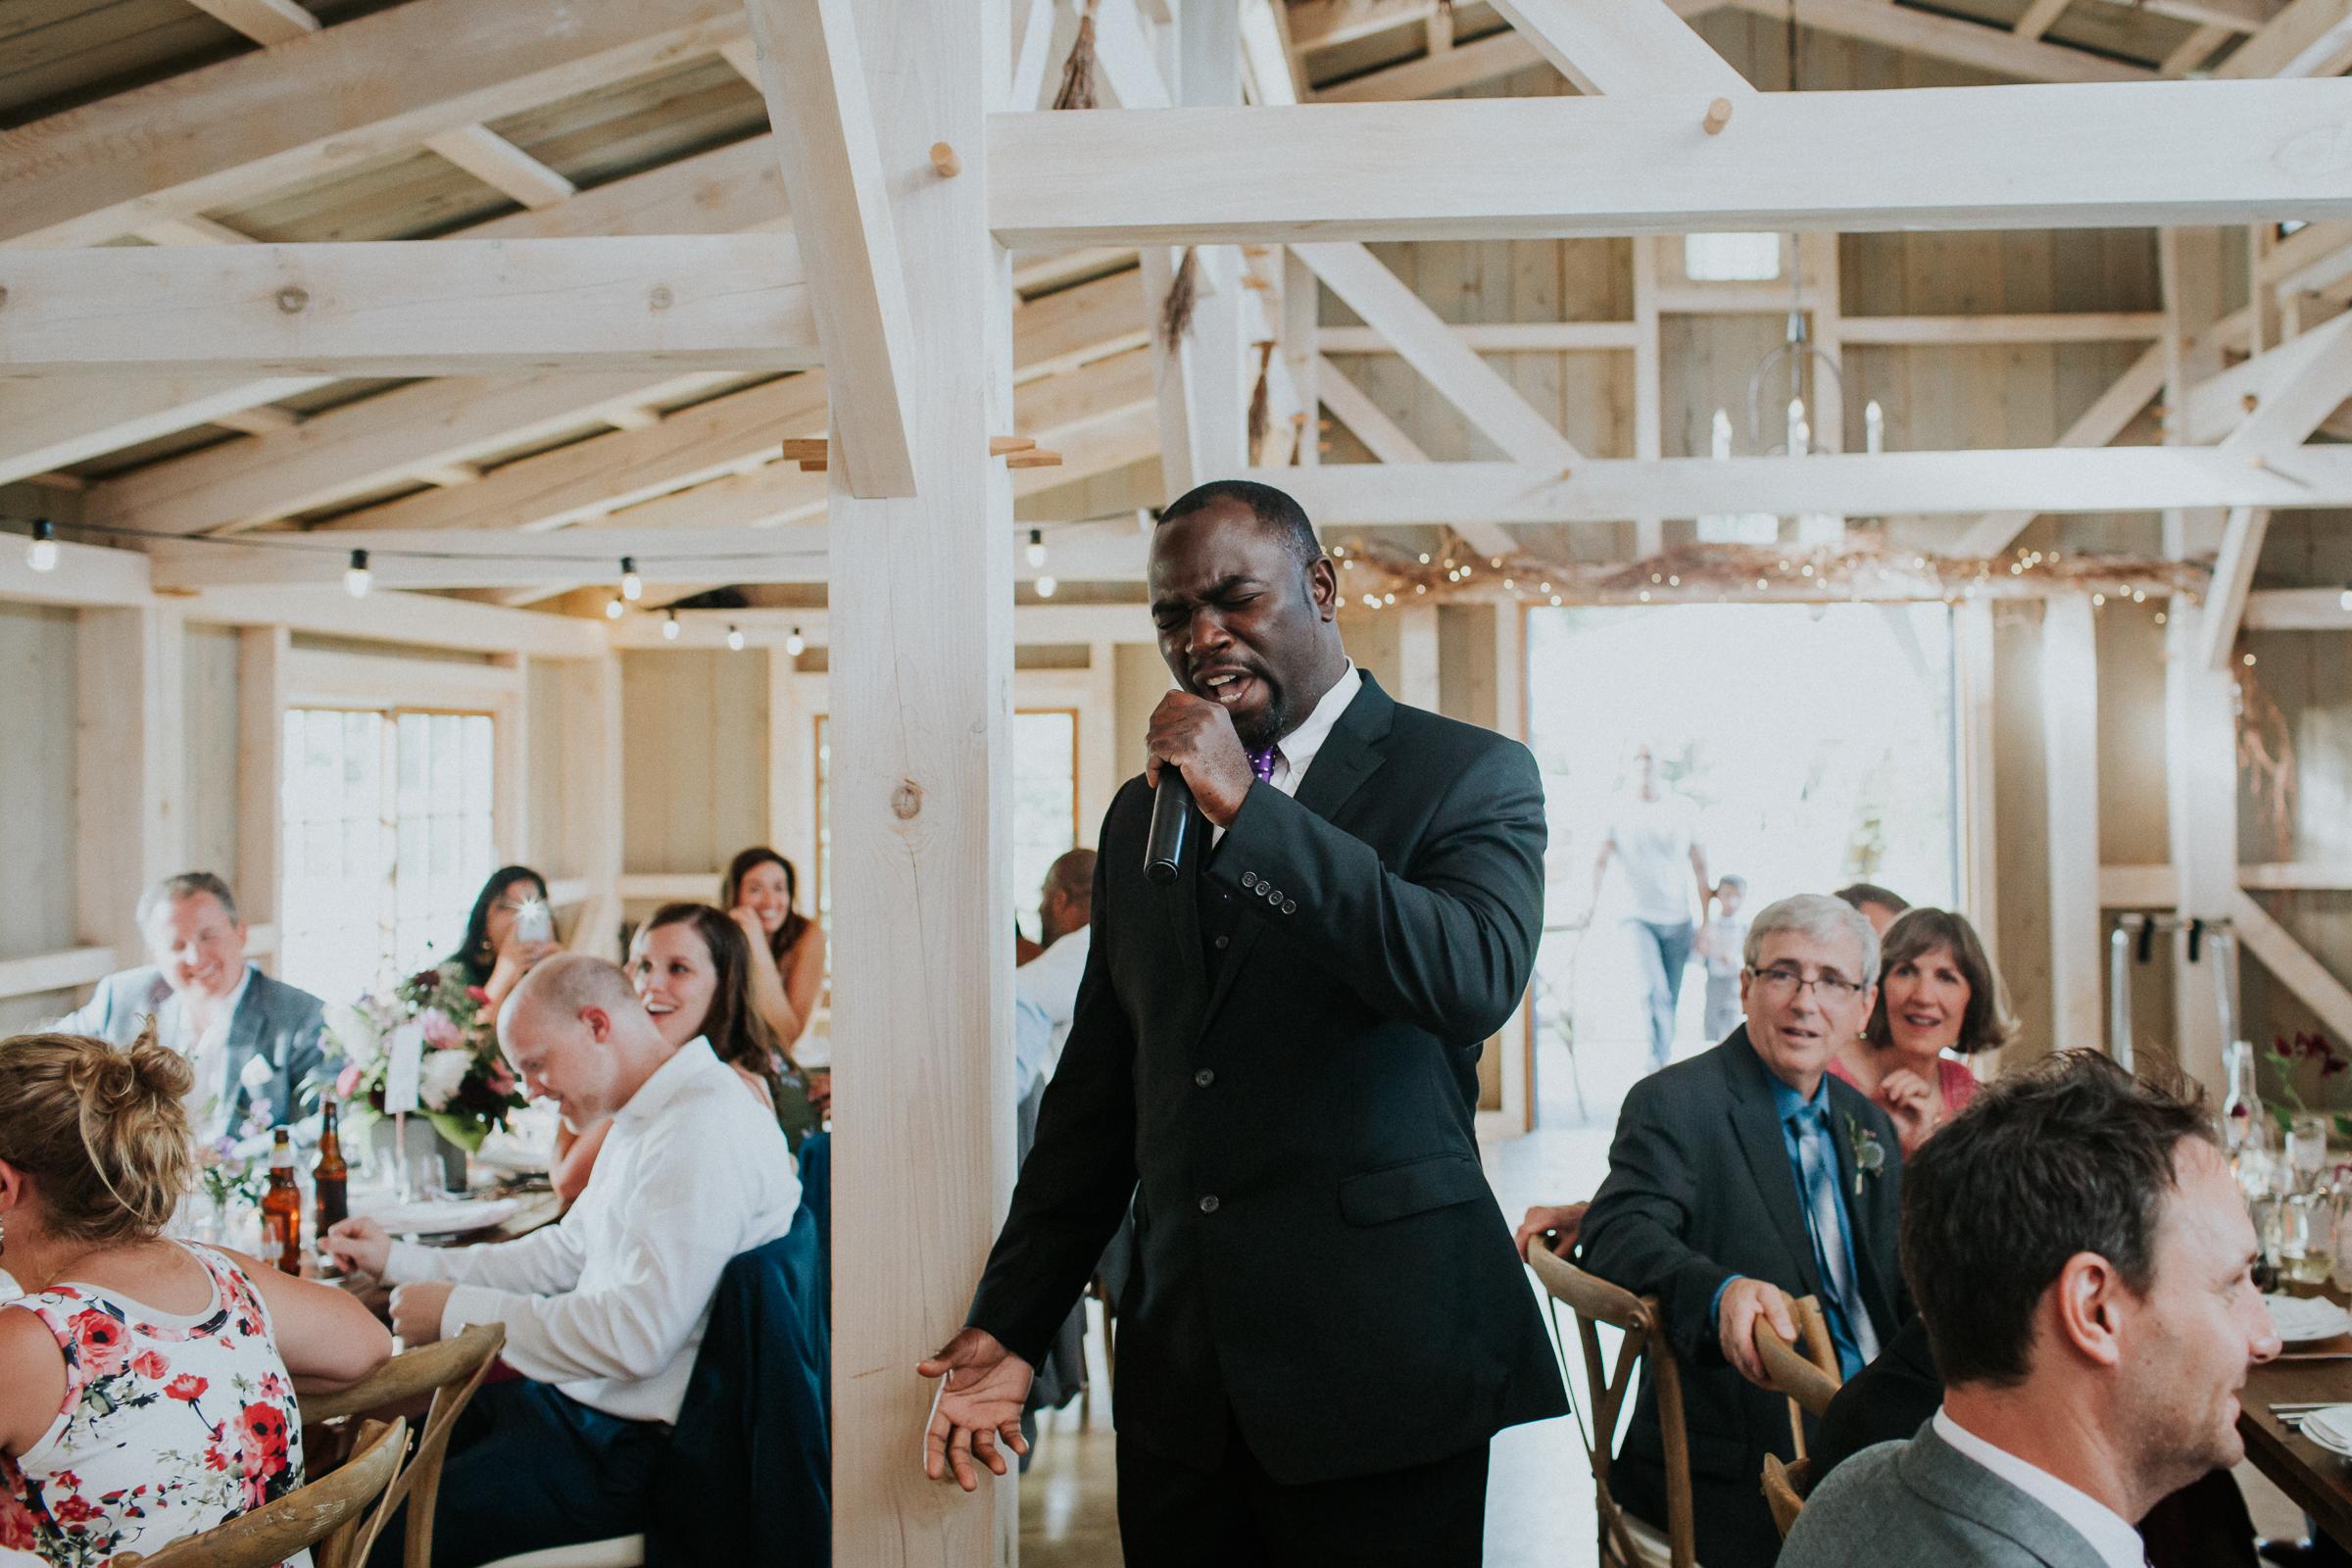 Marianmade-Farm-Wiscasset-Maine-Fine-Art-Documentary-Wedding-Photographer-Elvira-Kalviste-Photography-115.jpg